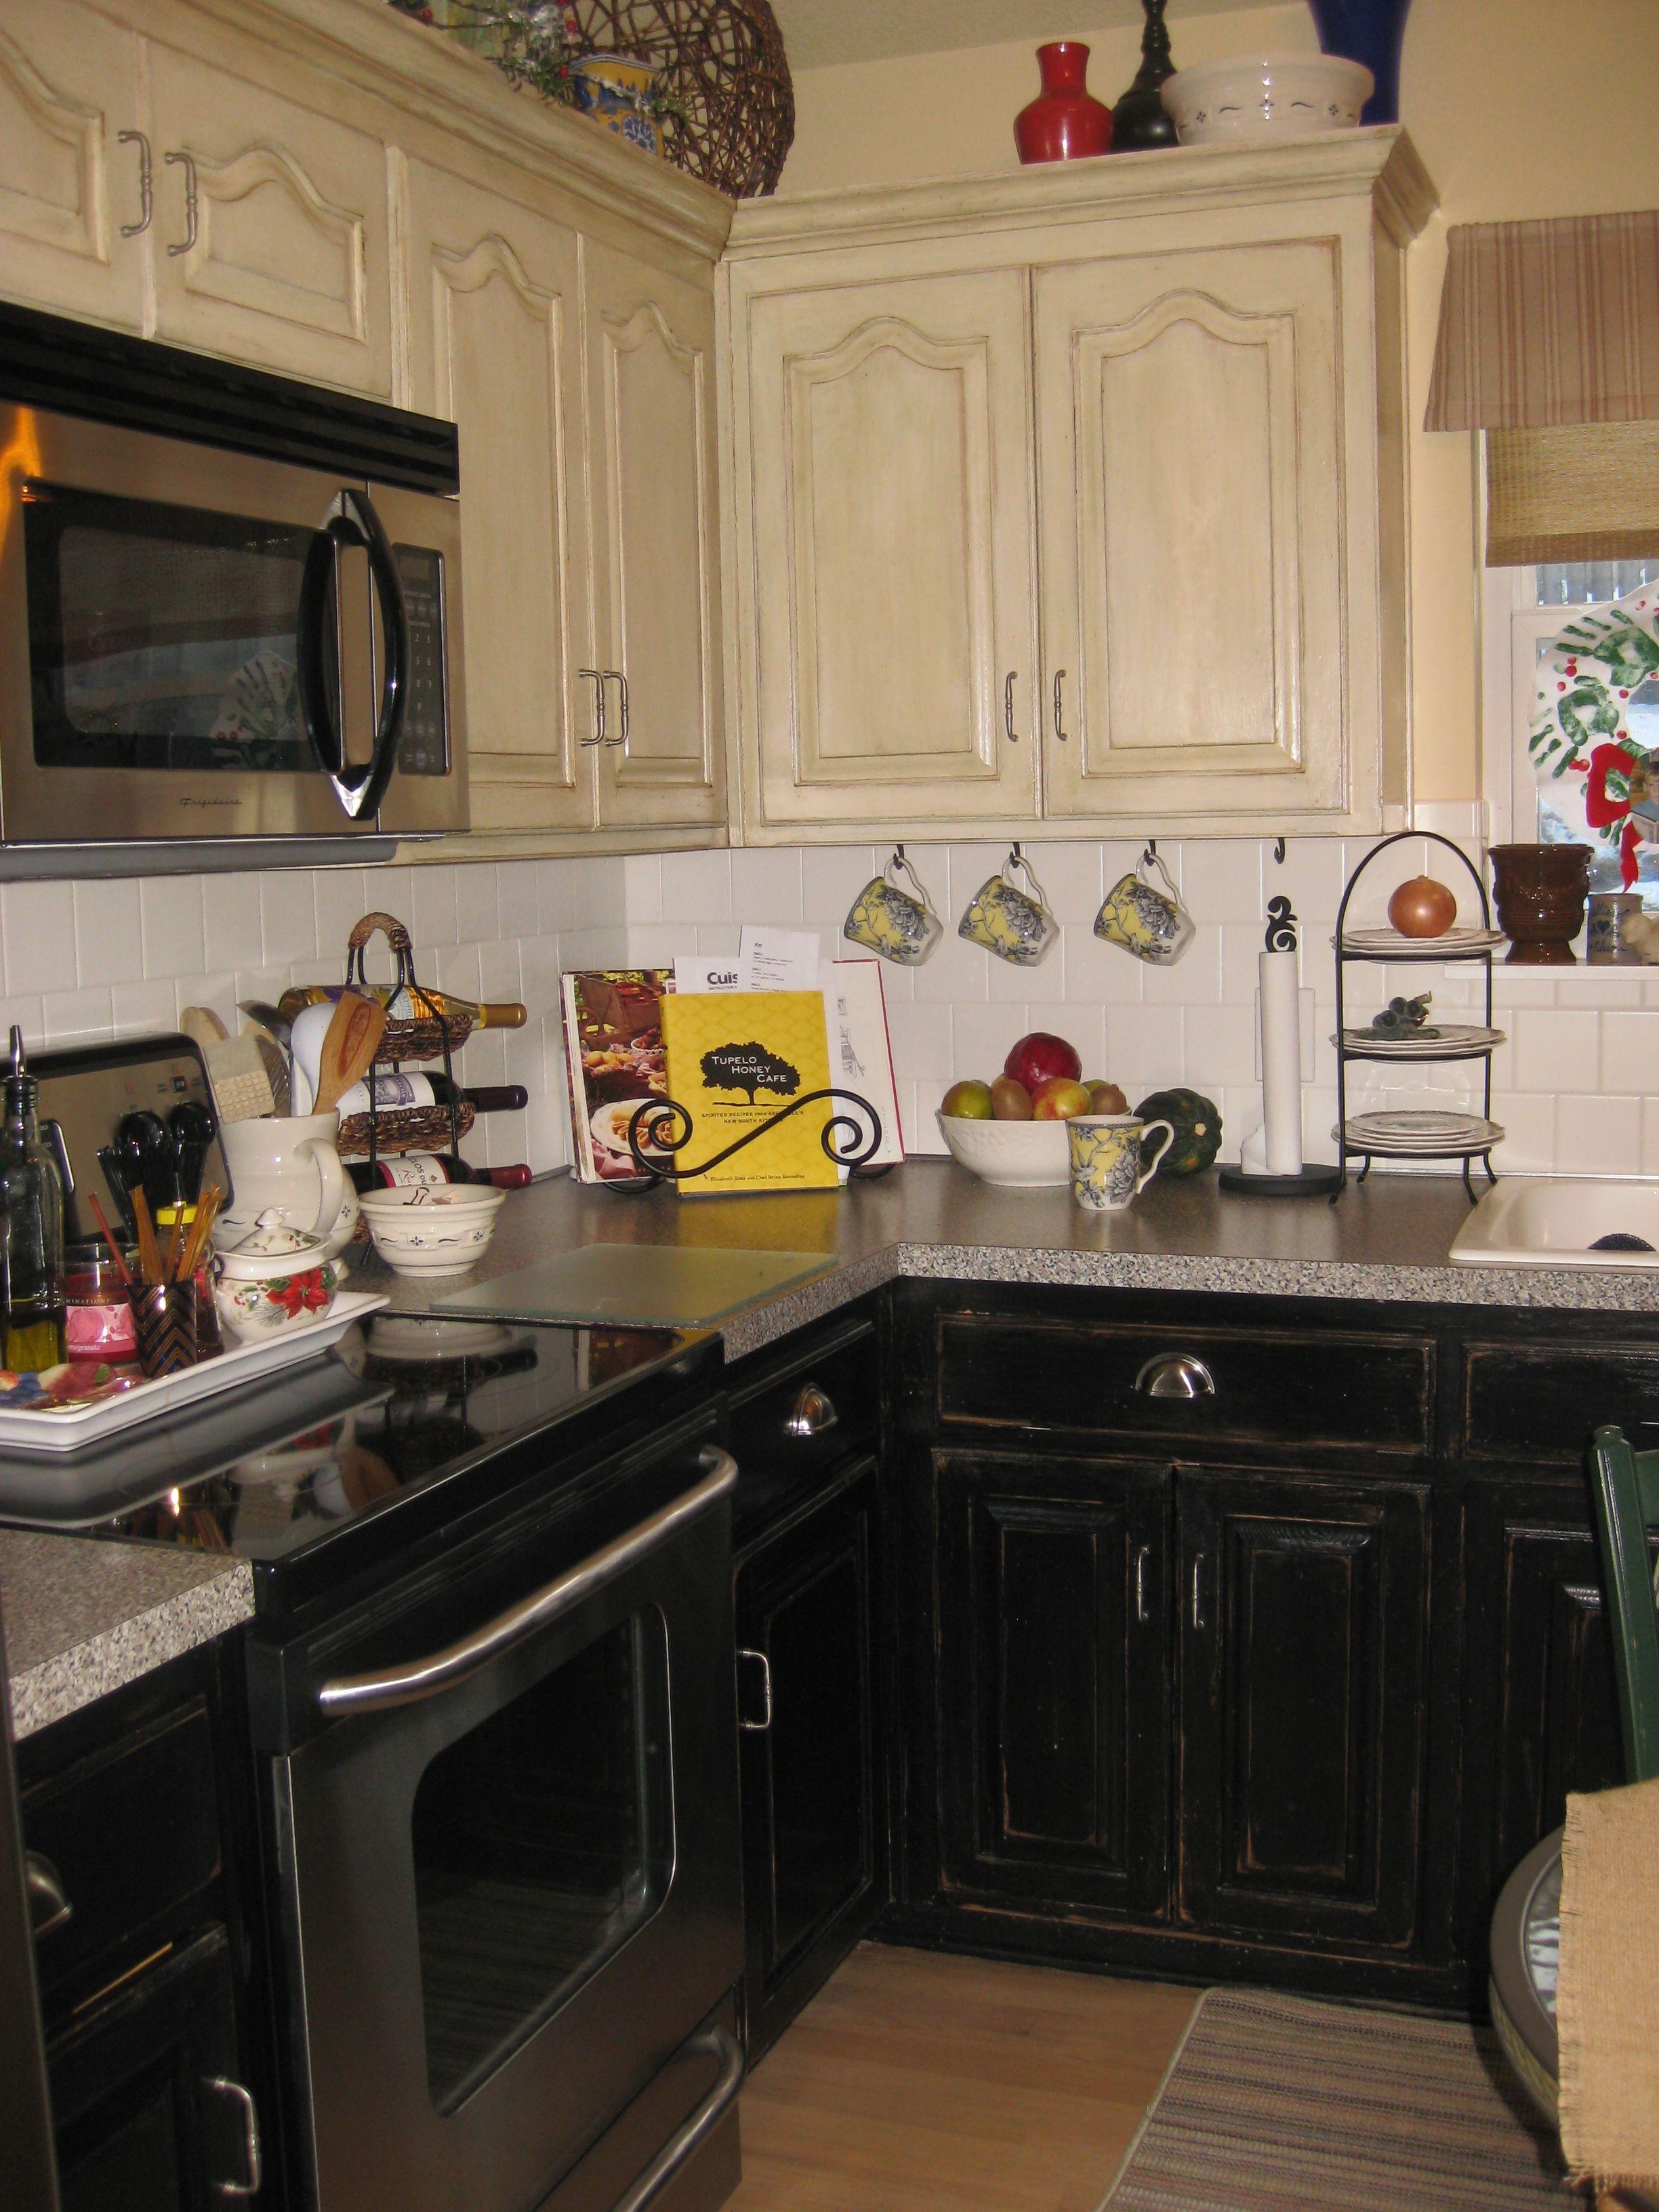 european kitchen with painted cabinets kgk designs defyenterpriseskimk gmail com painting on kitchen ideas european id=37894